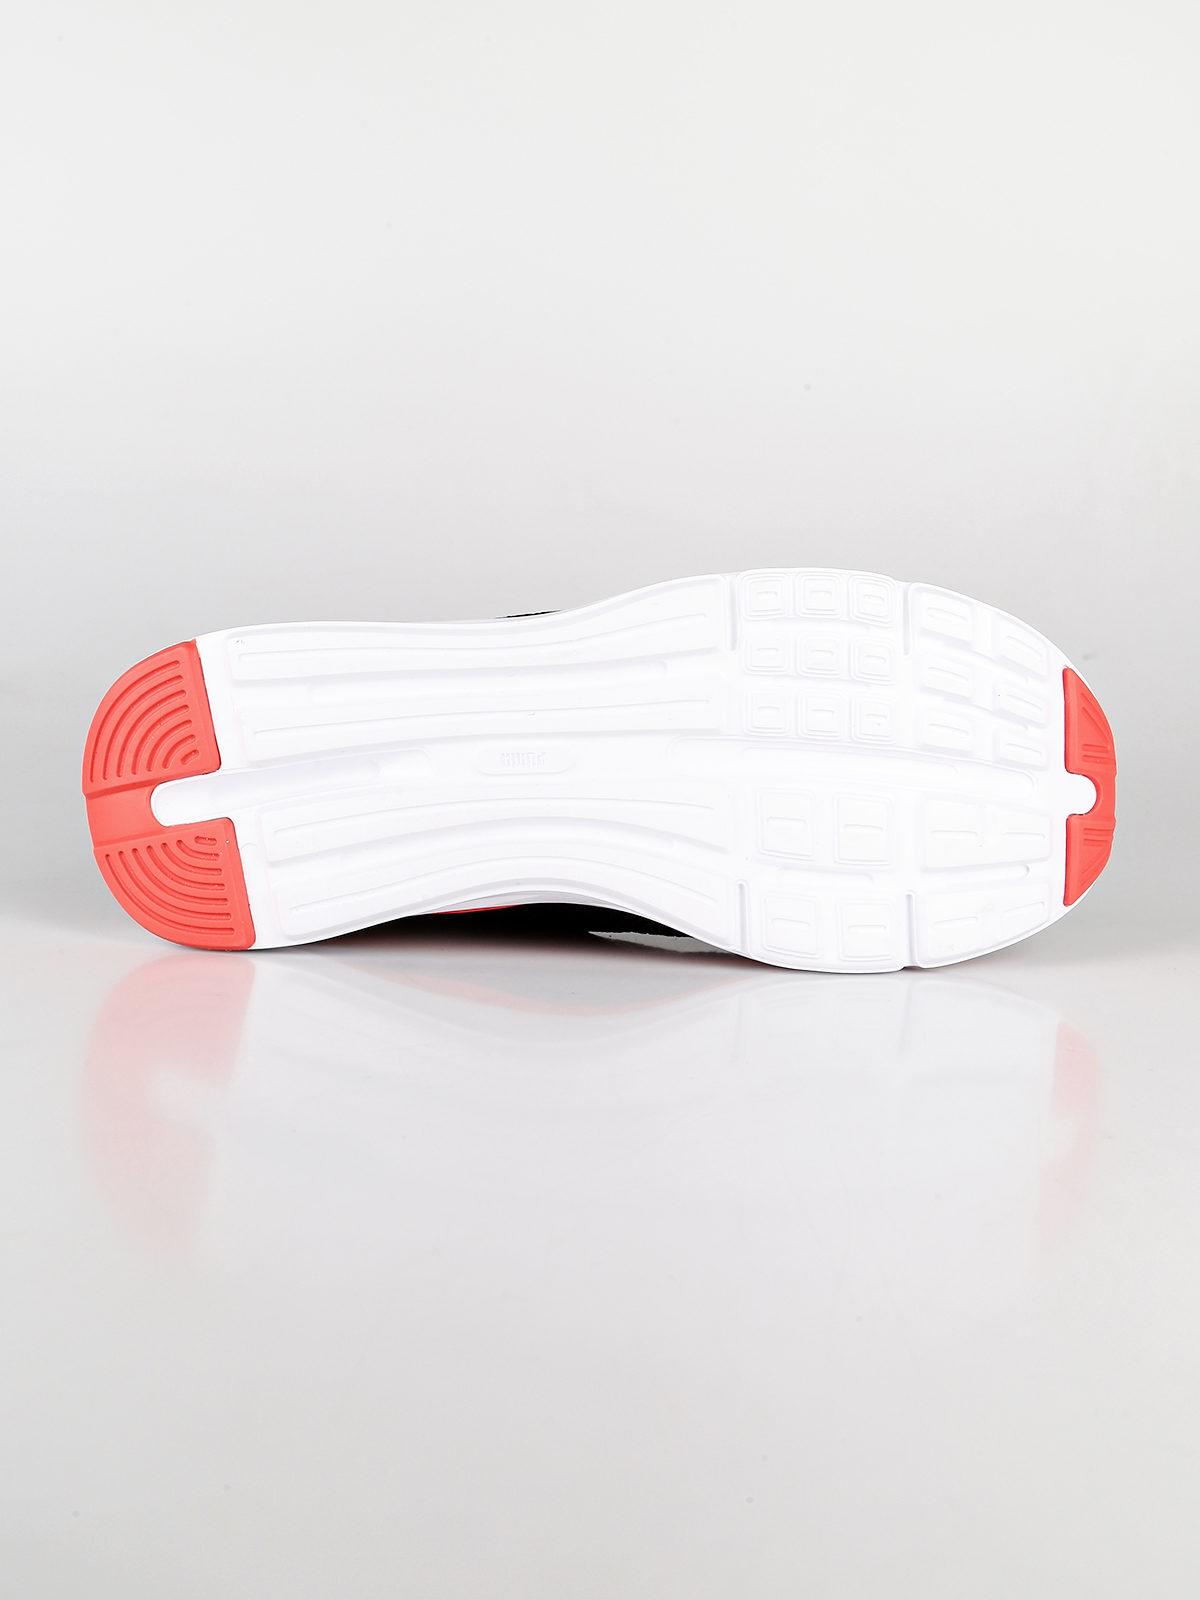 Enzo Beta Woven scarpe training nere puma | MecShopping